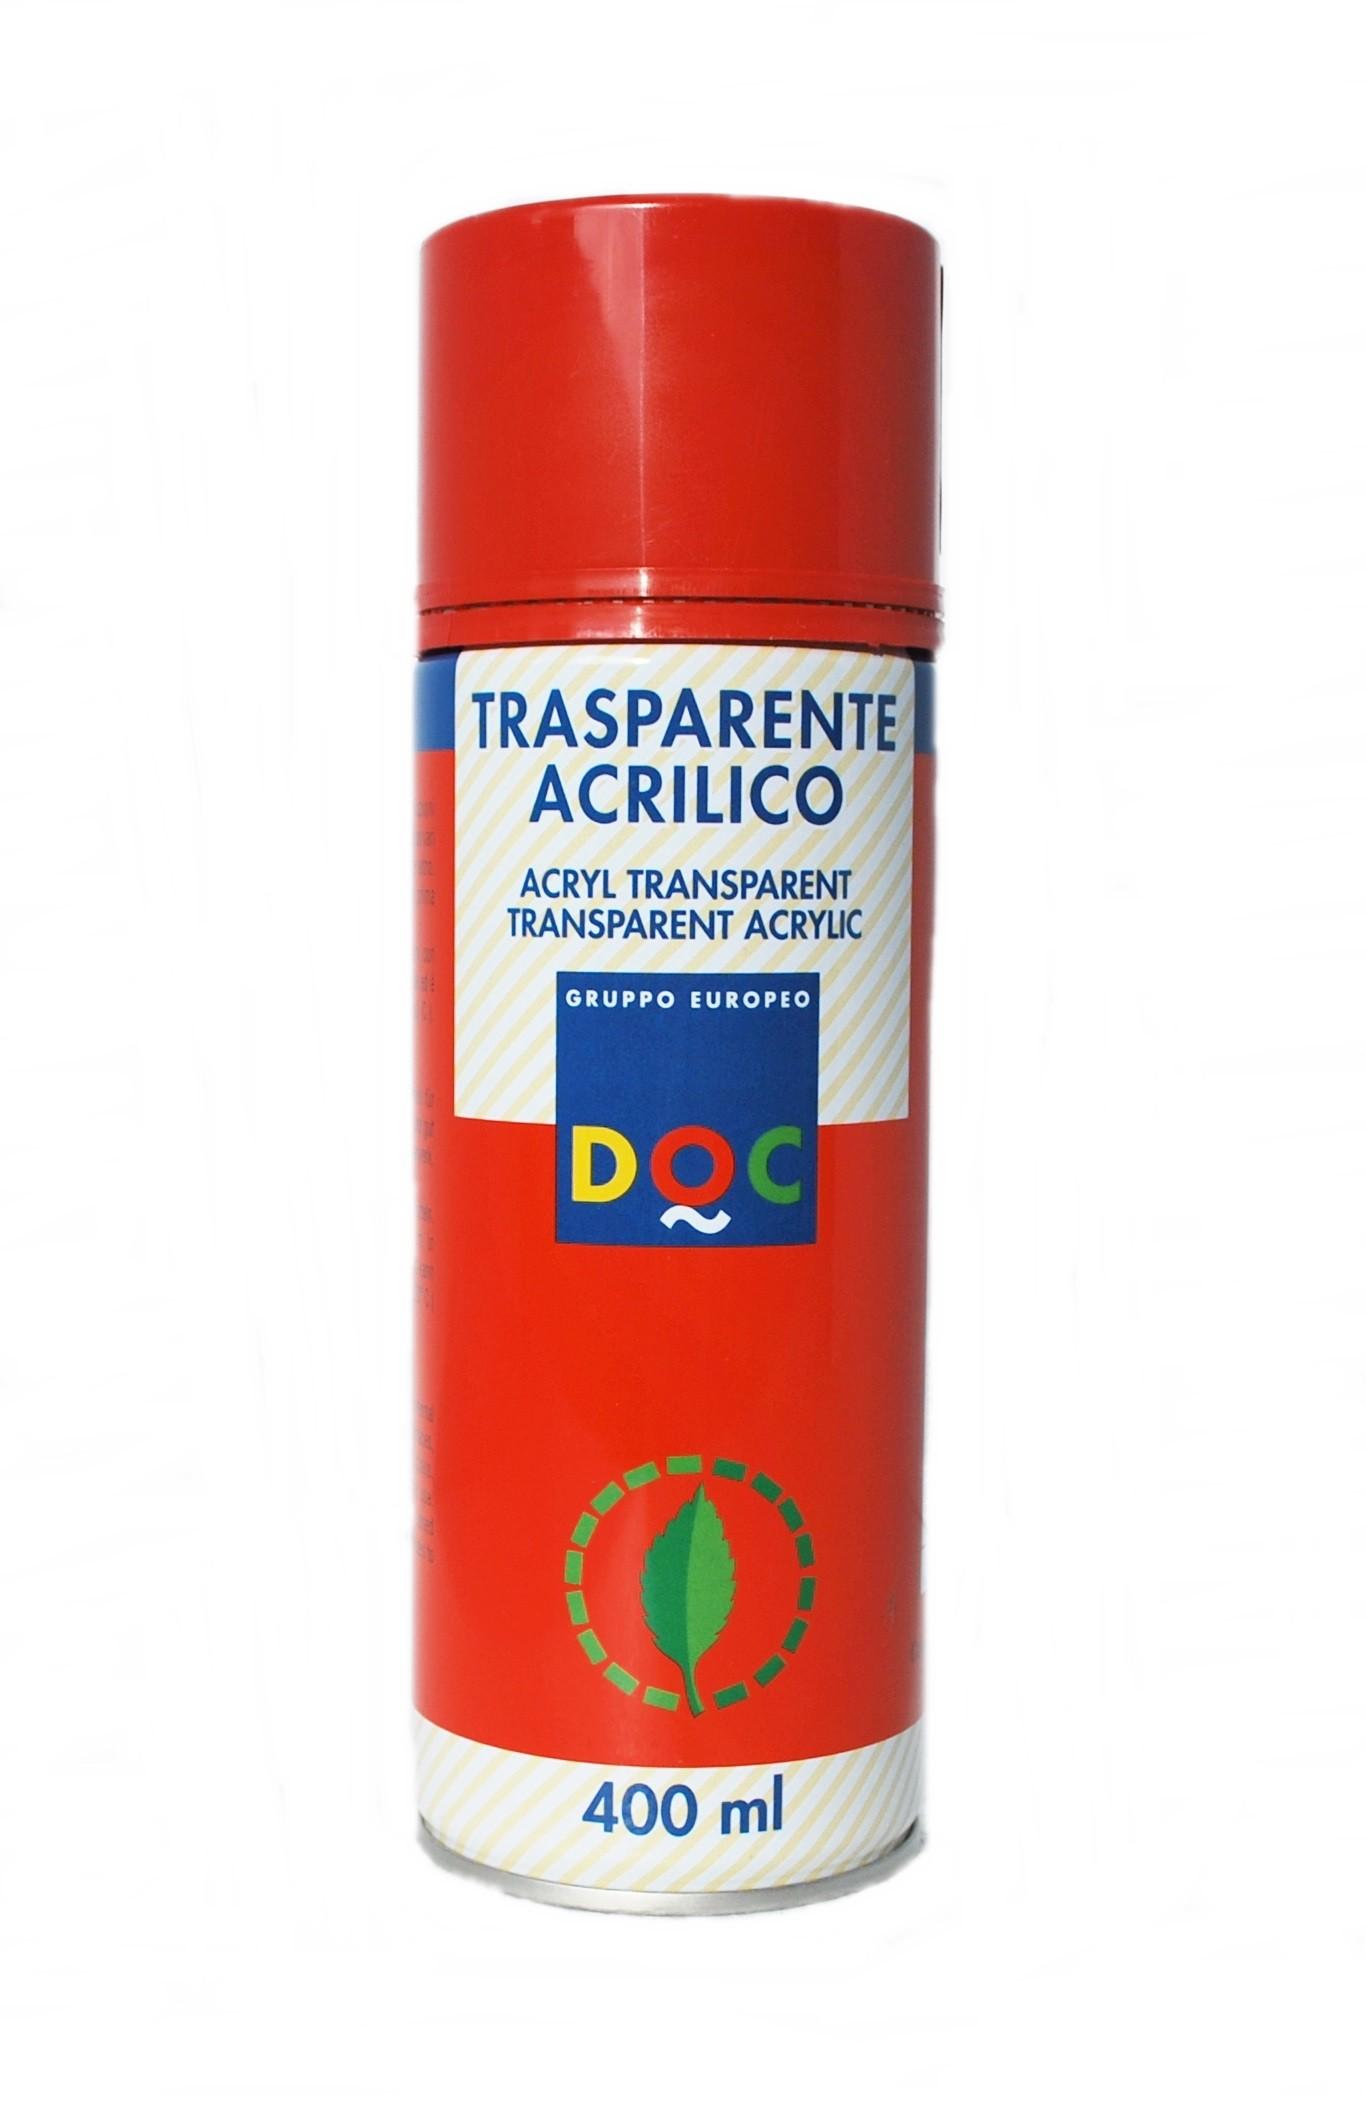 ACRYLSPRAY VERNICE TRASPARENTE LUCIDA/OPACA ML.400